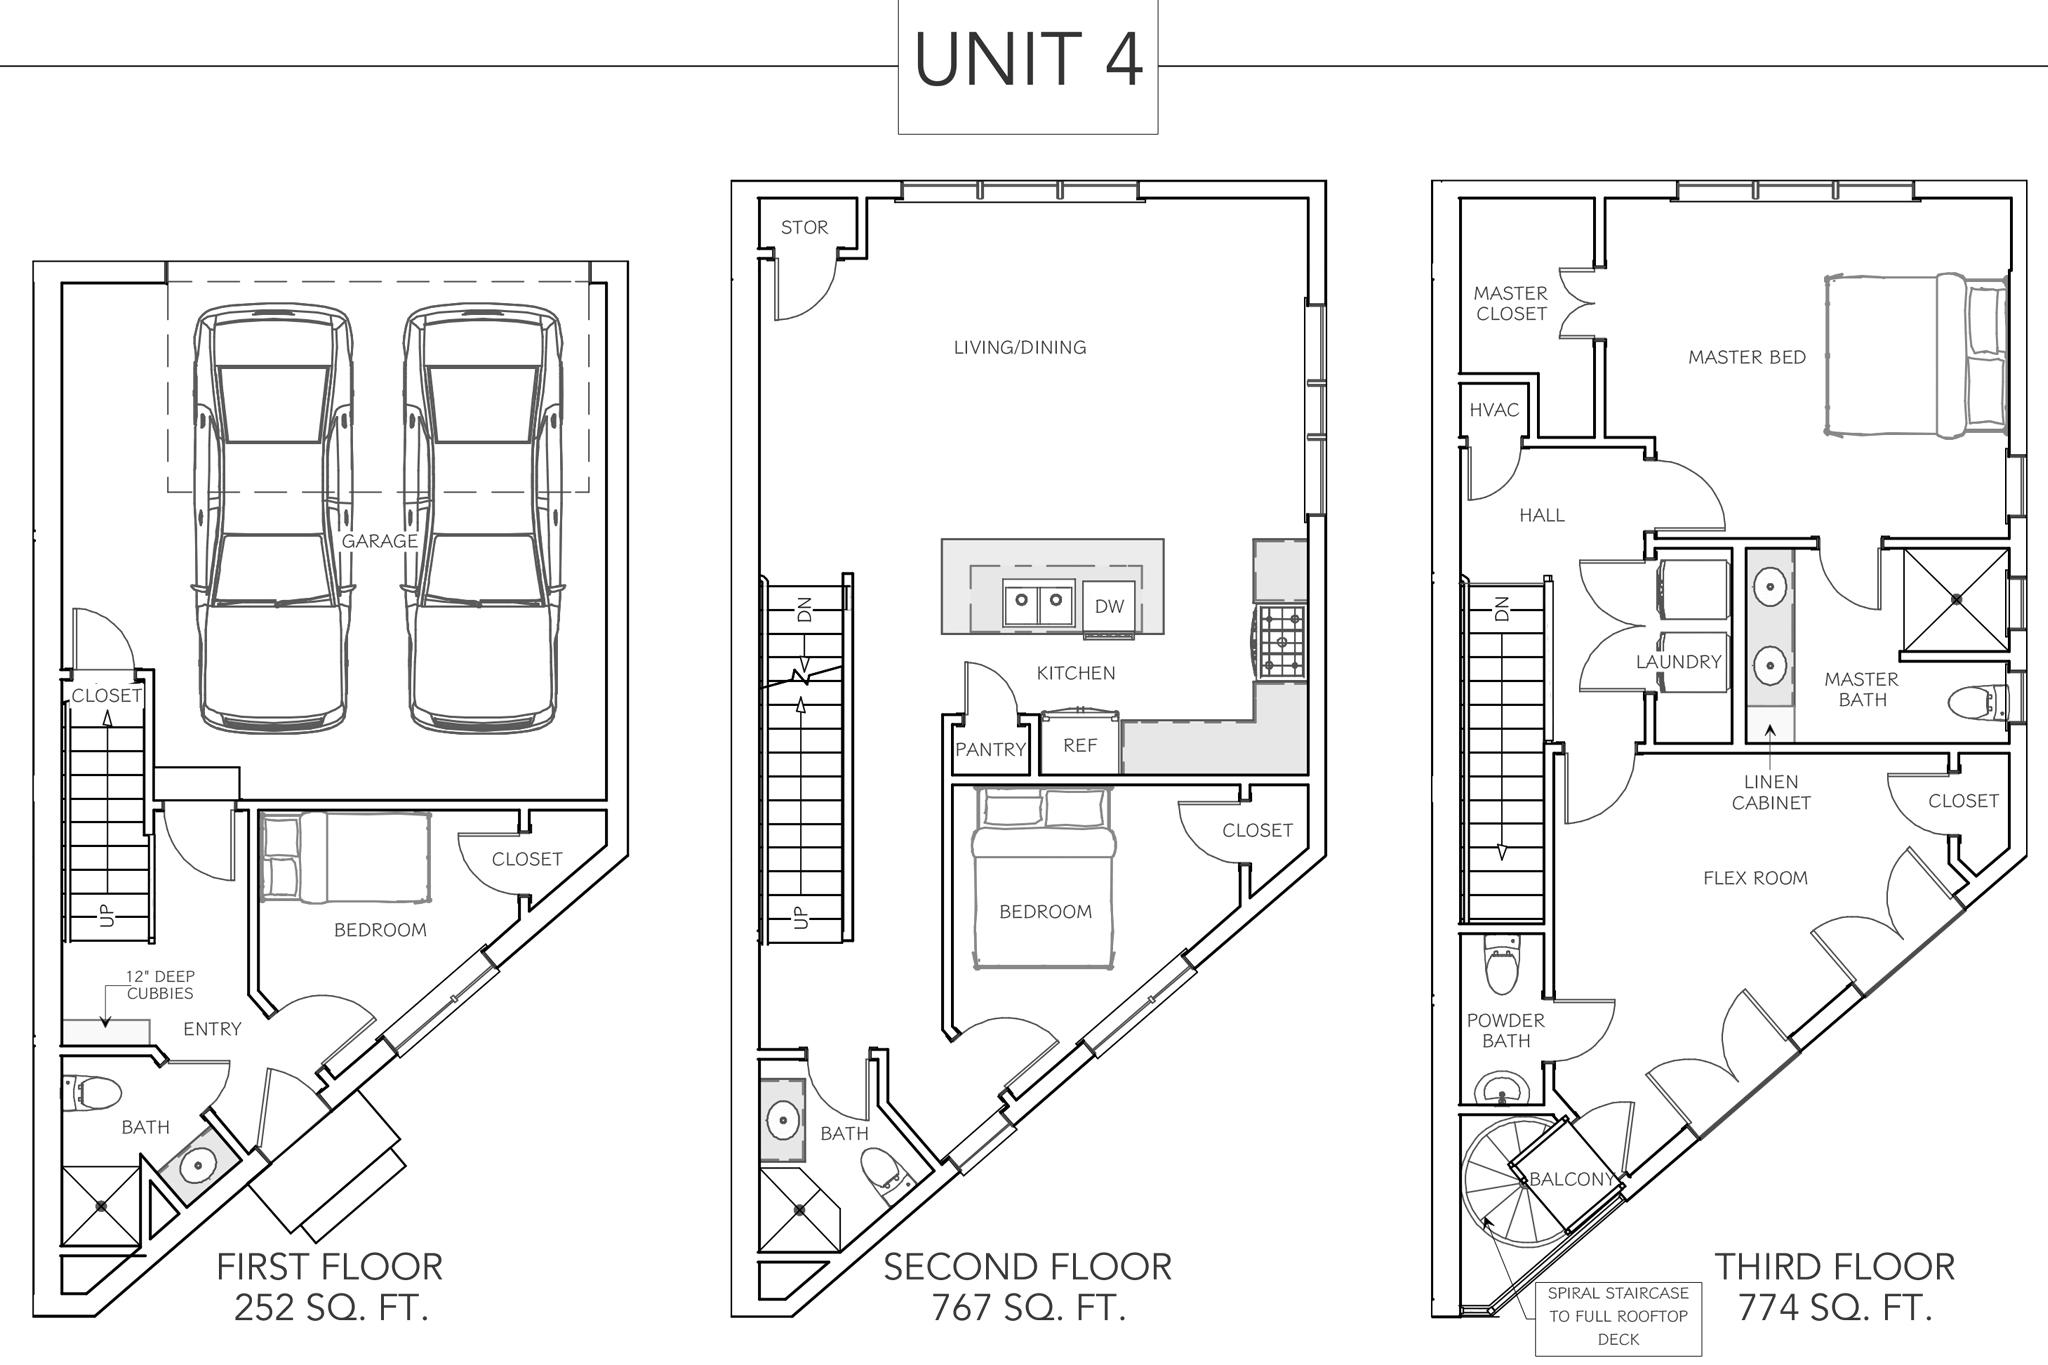 Hart Love Builders Villery Place unit 4.jpg